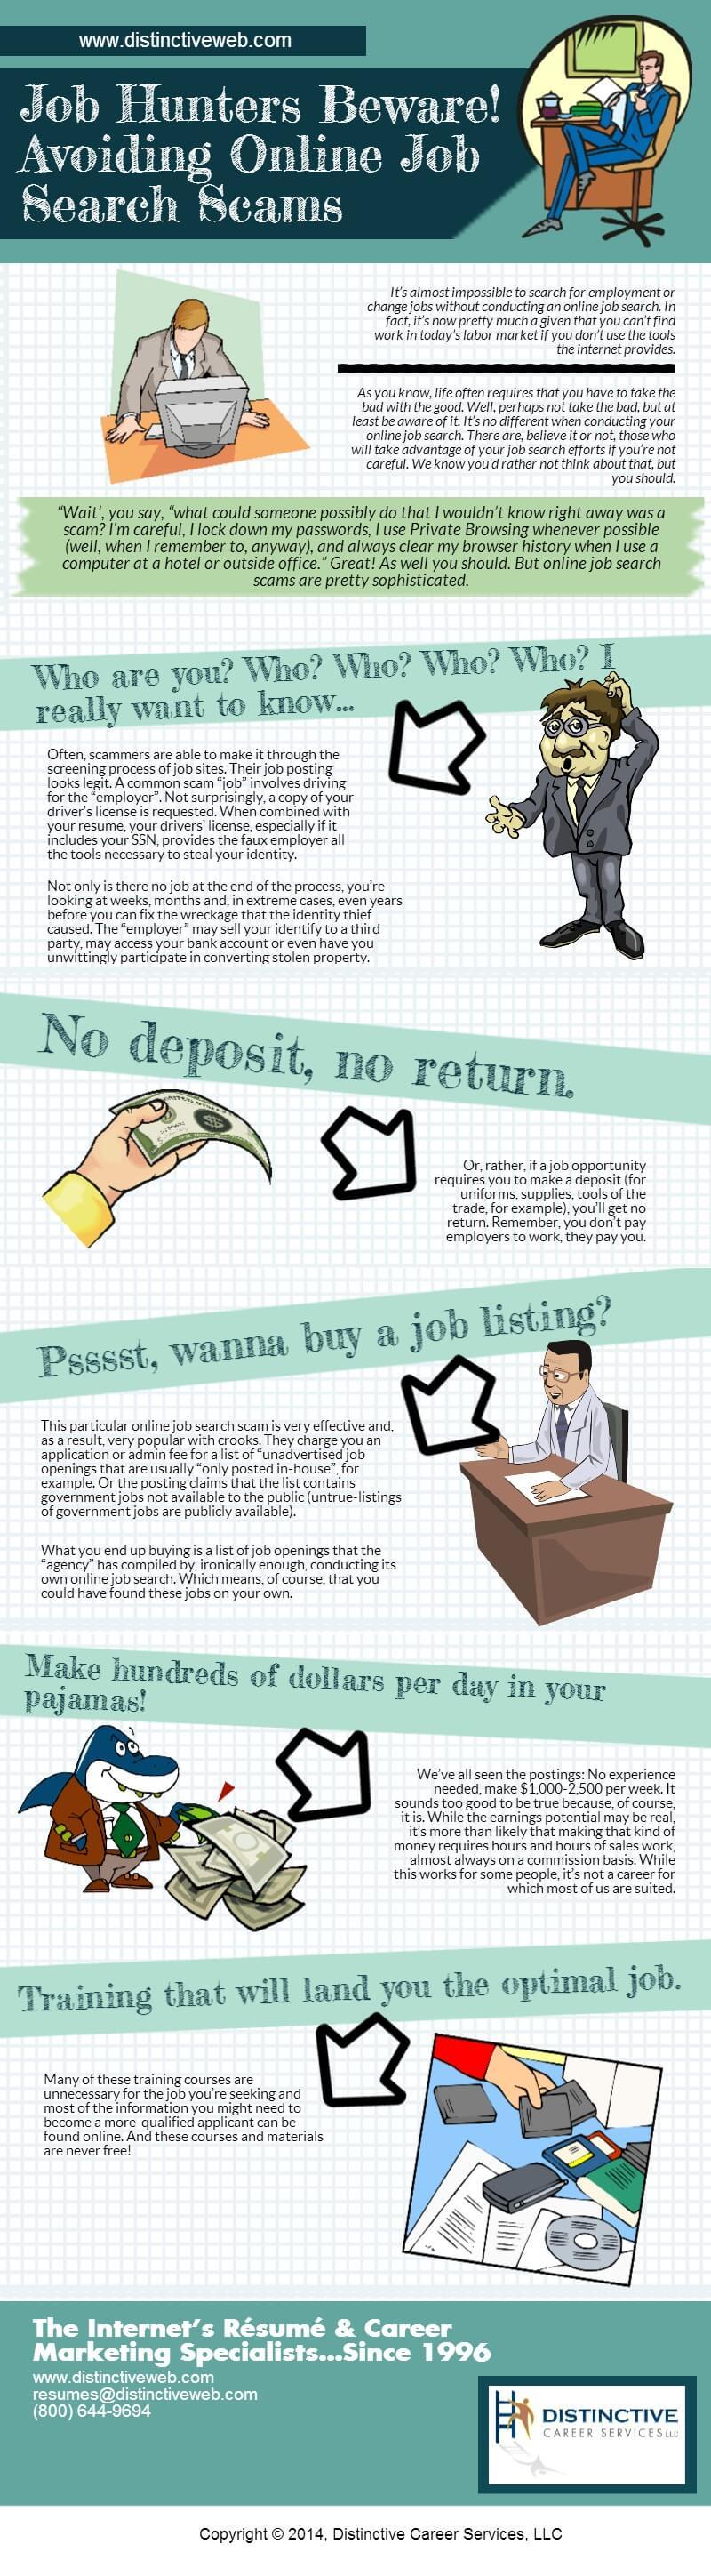 Job Hunters Beware! Avoiding Online Job Search Scams